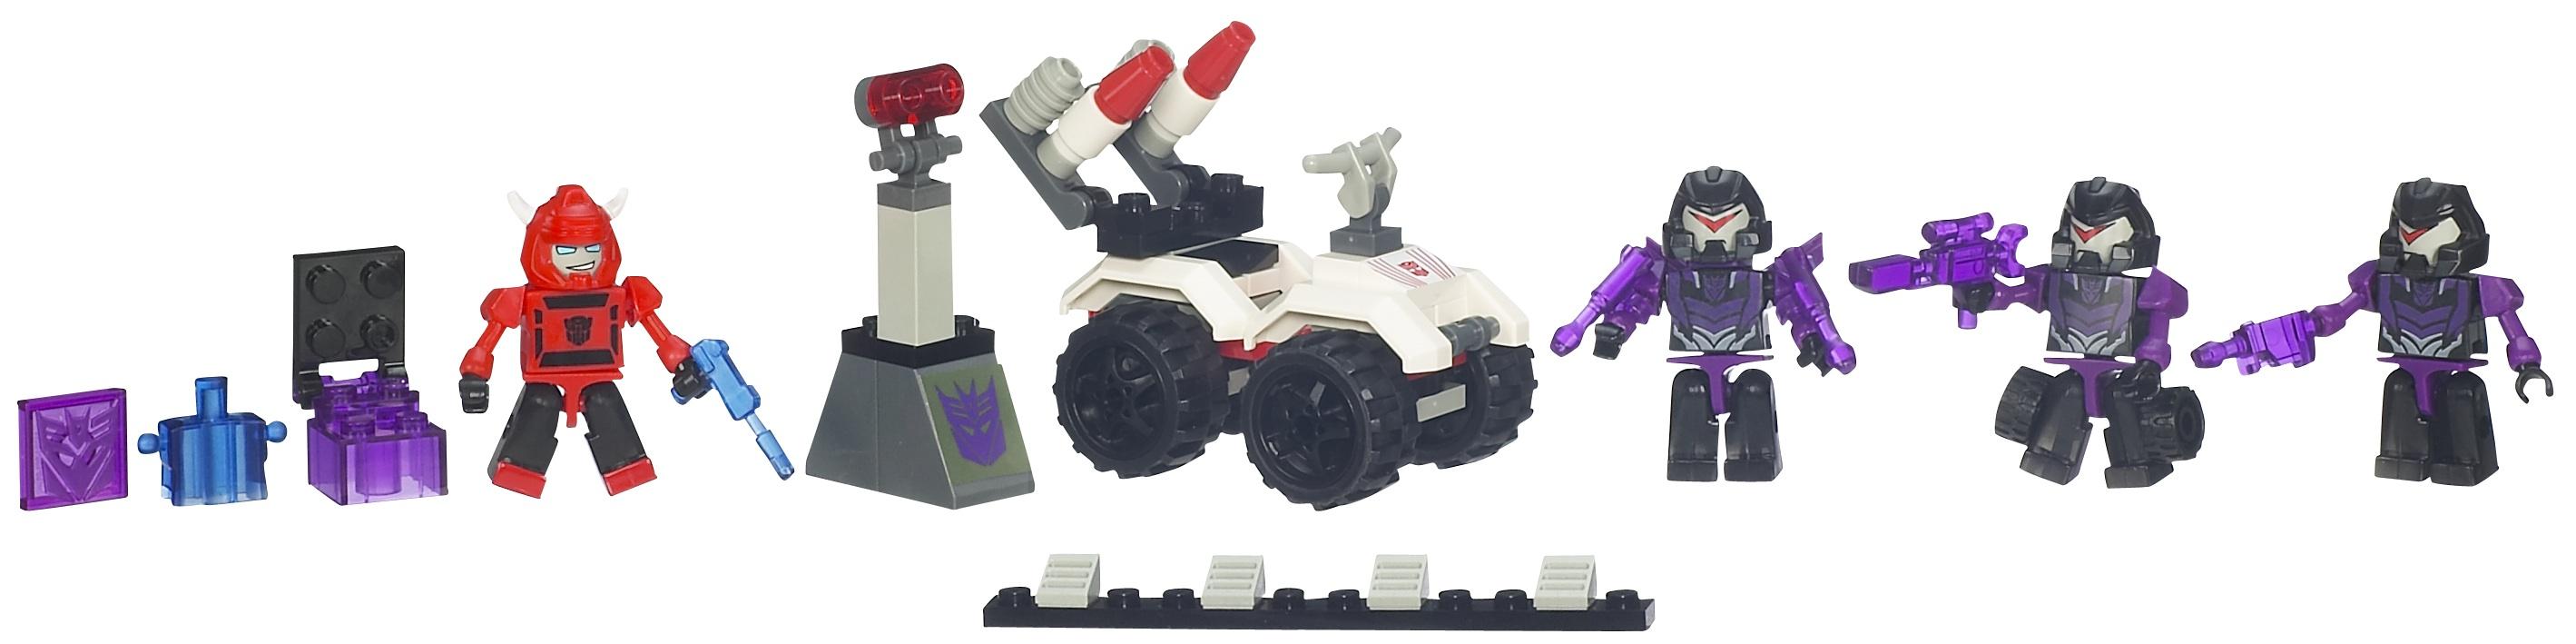 KREO Transformers Image 2